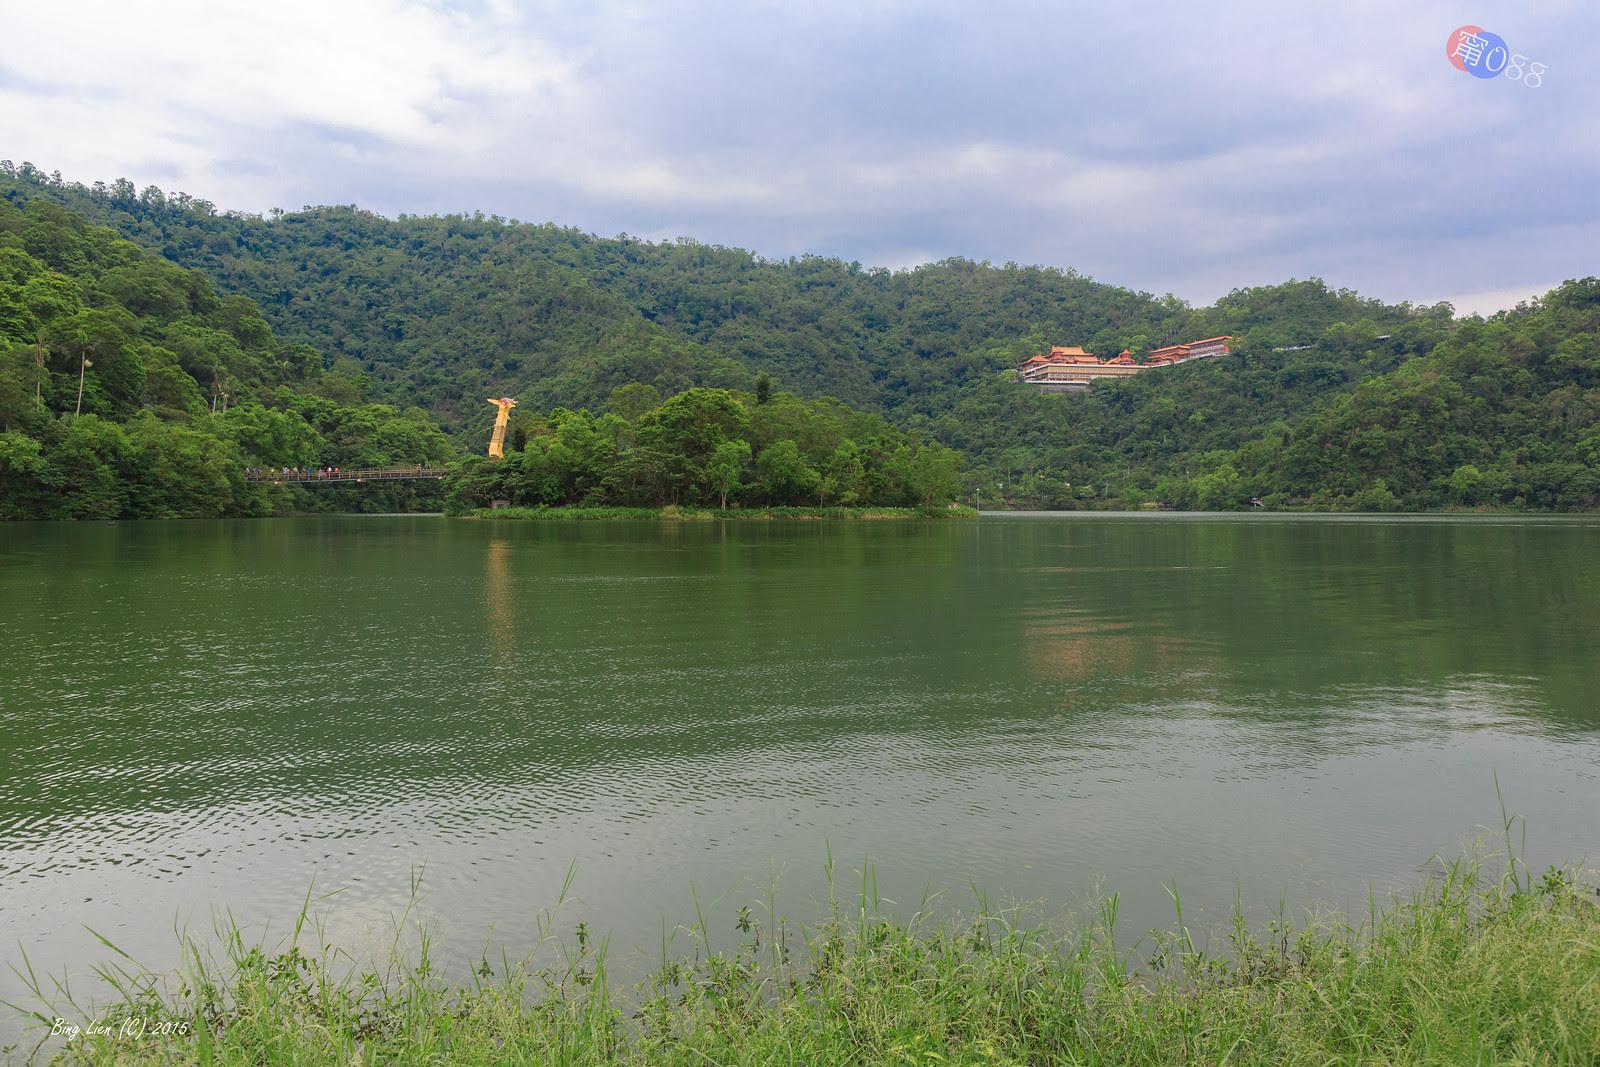 WATER_BING5742_LR